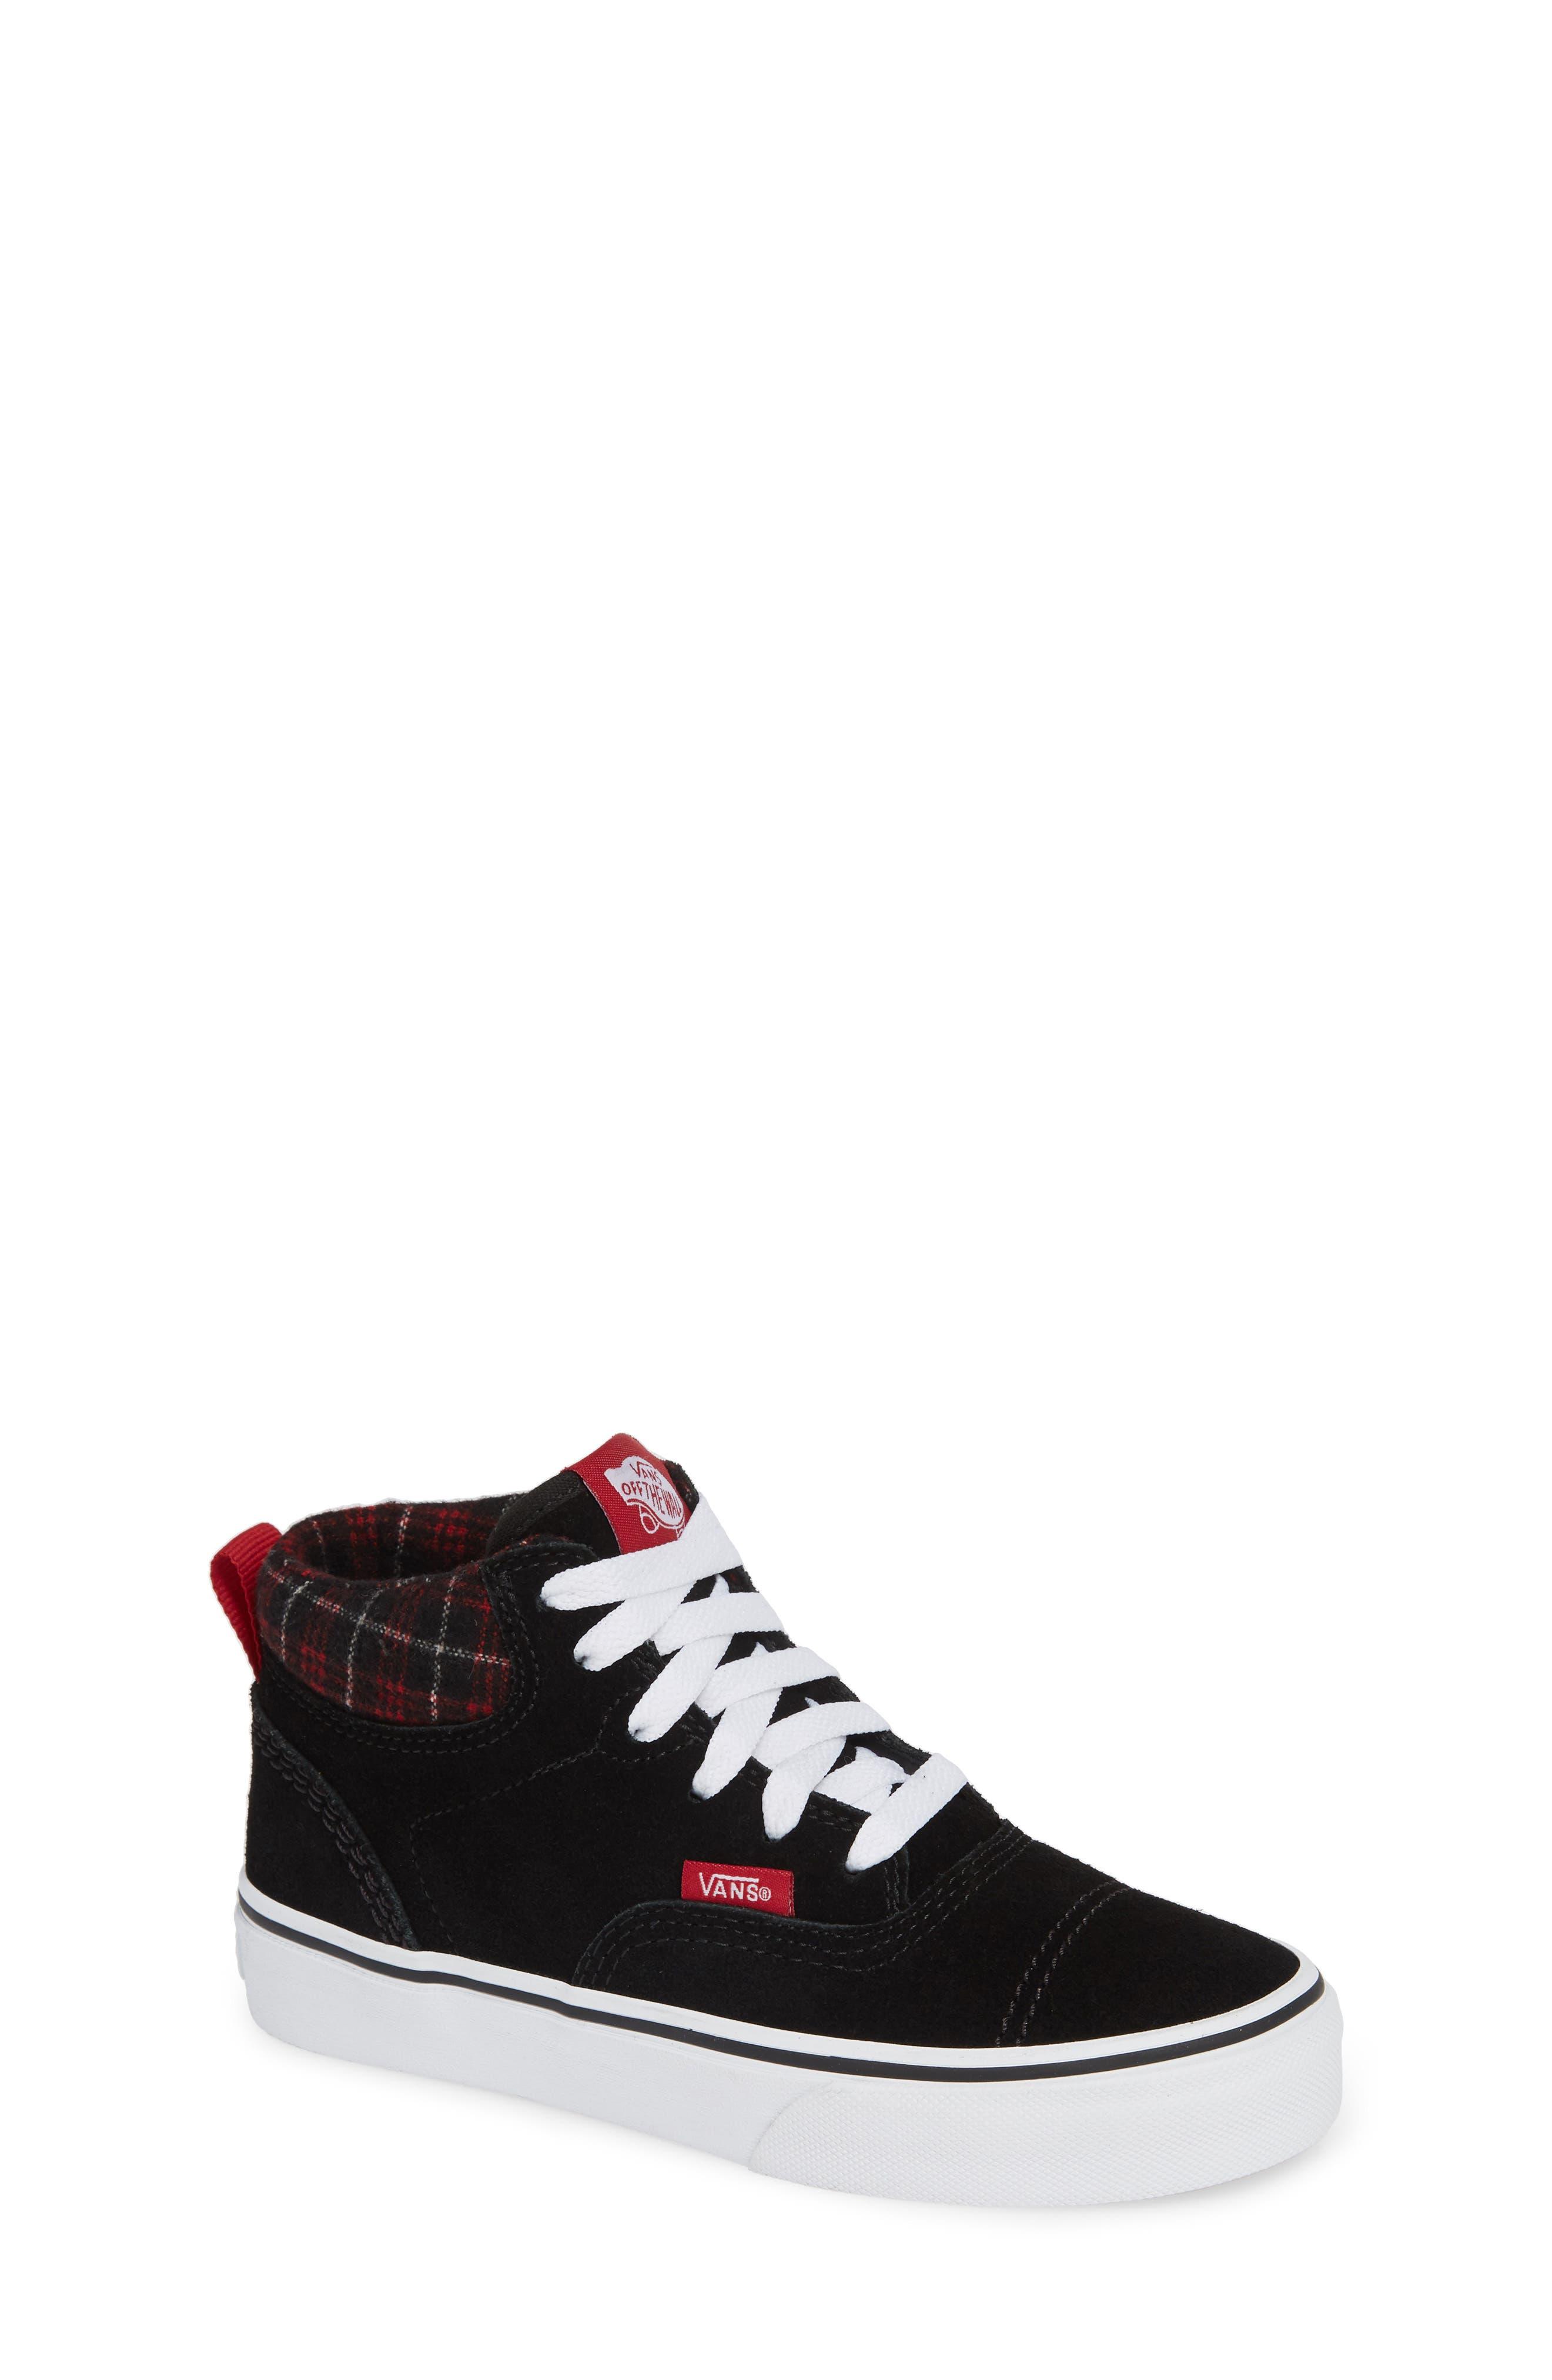 Era - Hi Sneaker,                             Main thumbnail 1, color,                             SUEDE AND PLAID BLACK/ WHITE